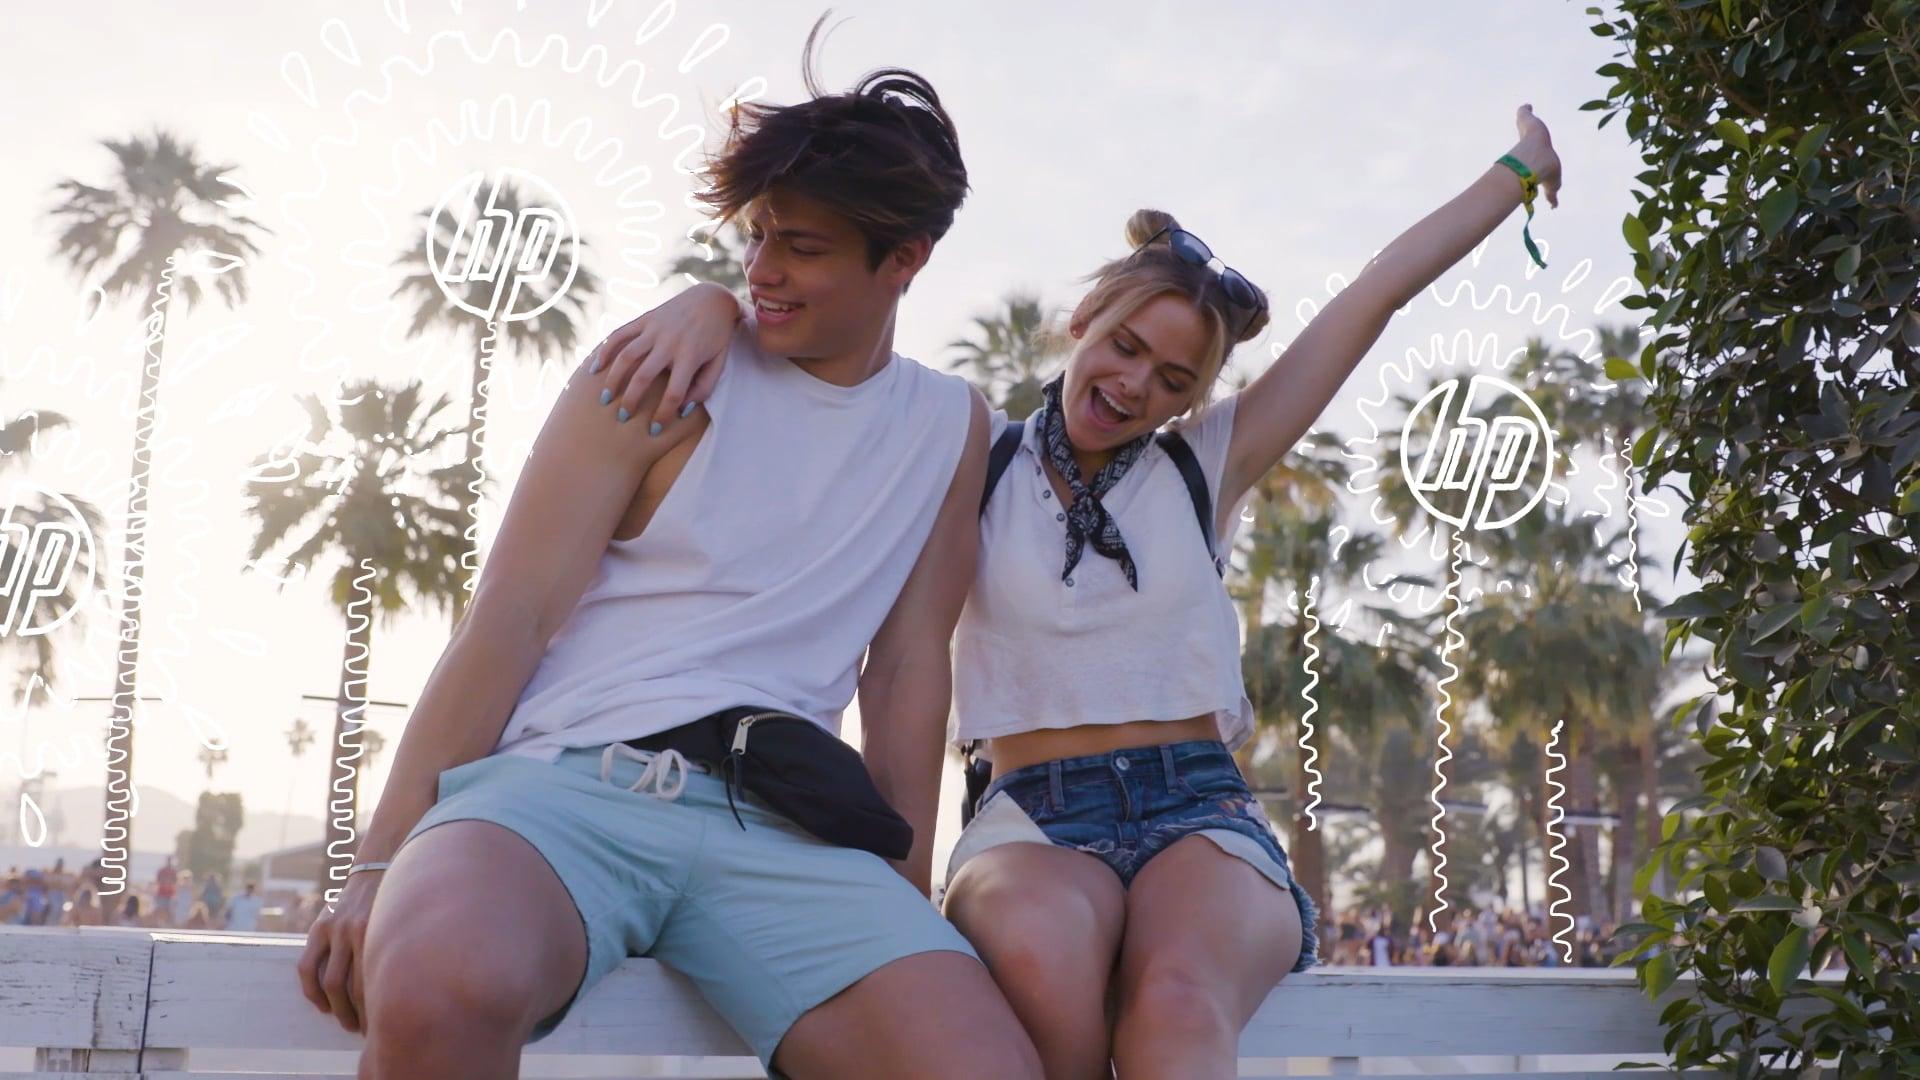 Coachella with Dylan Jordan - HP